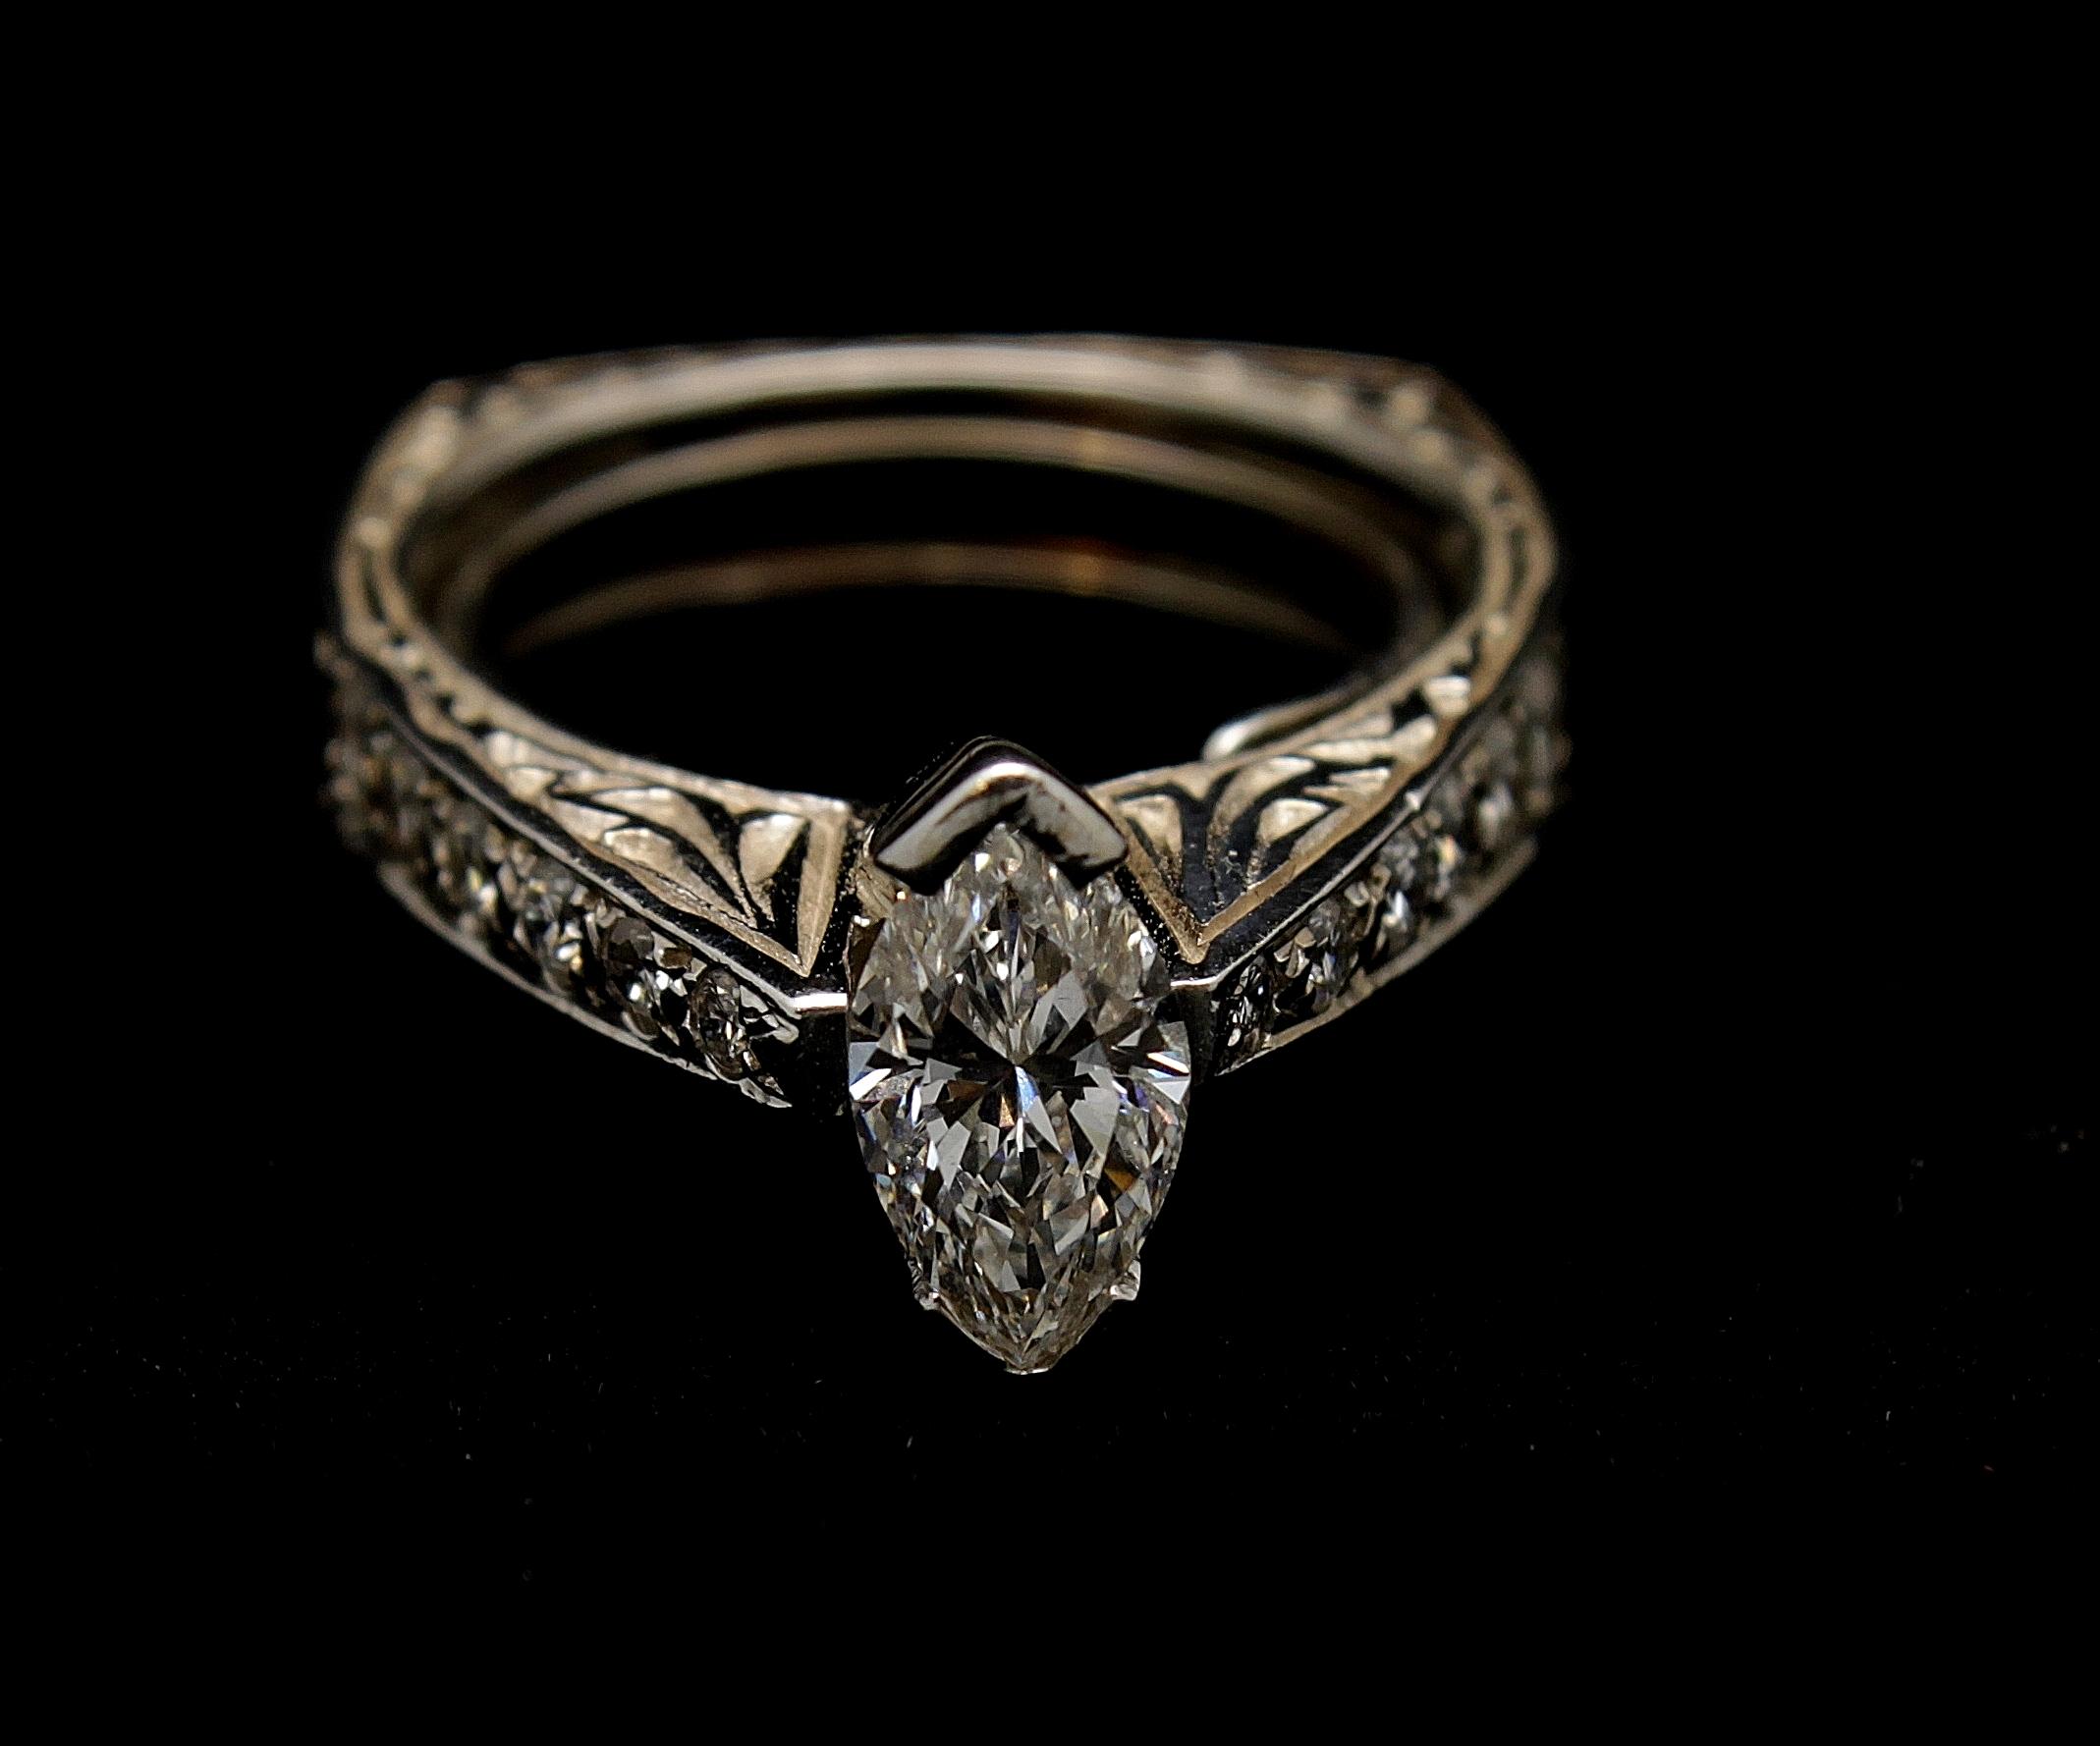 Vintage 14kt Diamond Ring 1.4cts